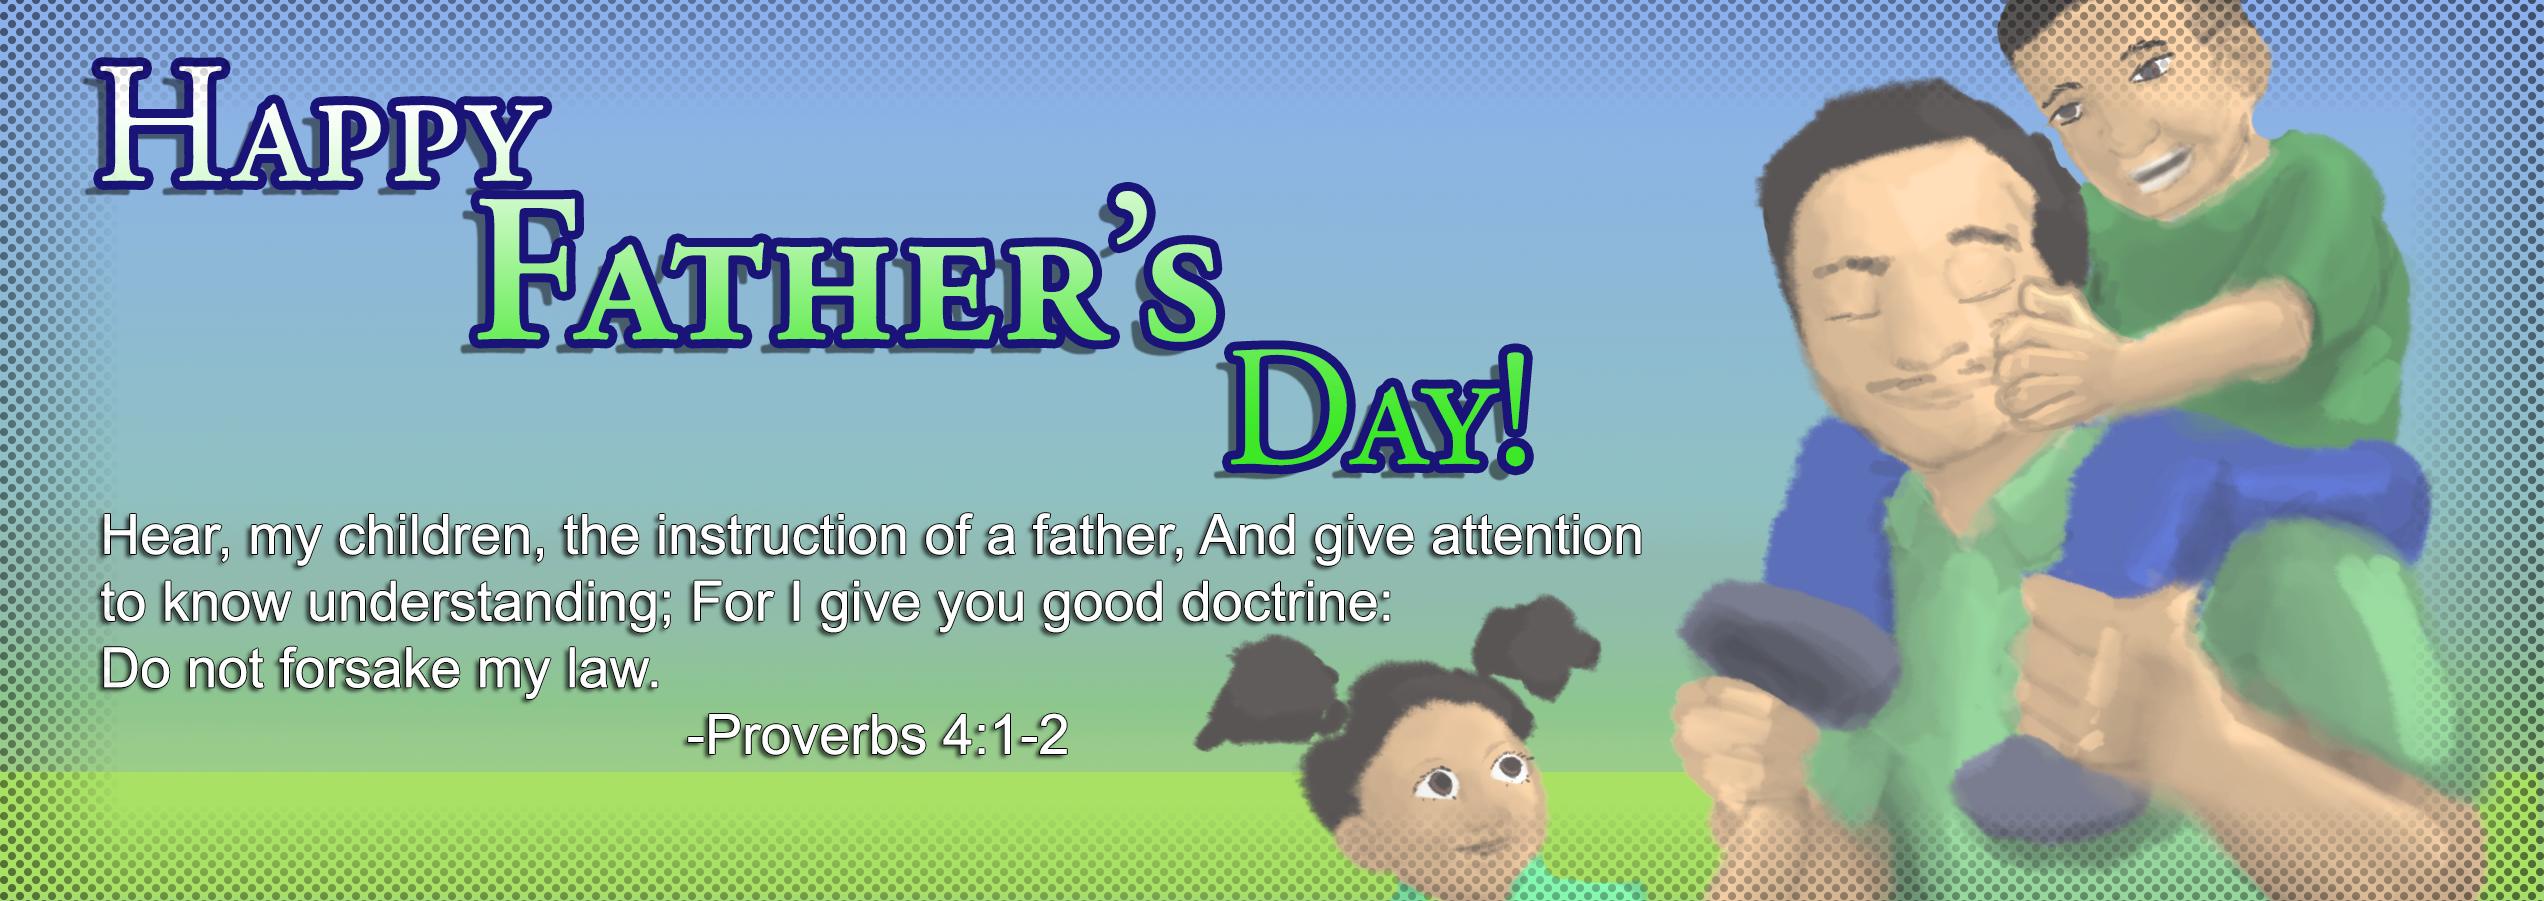 FathersDay2017